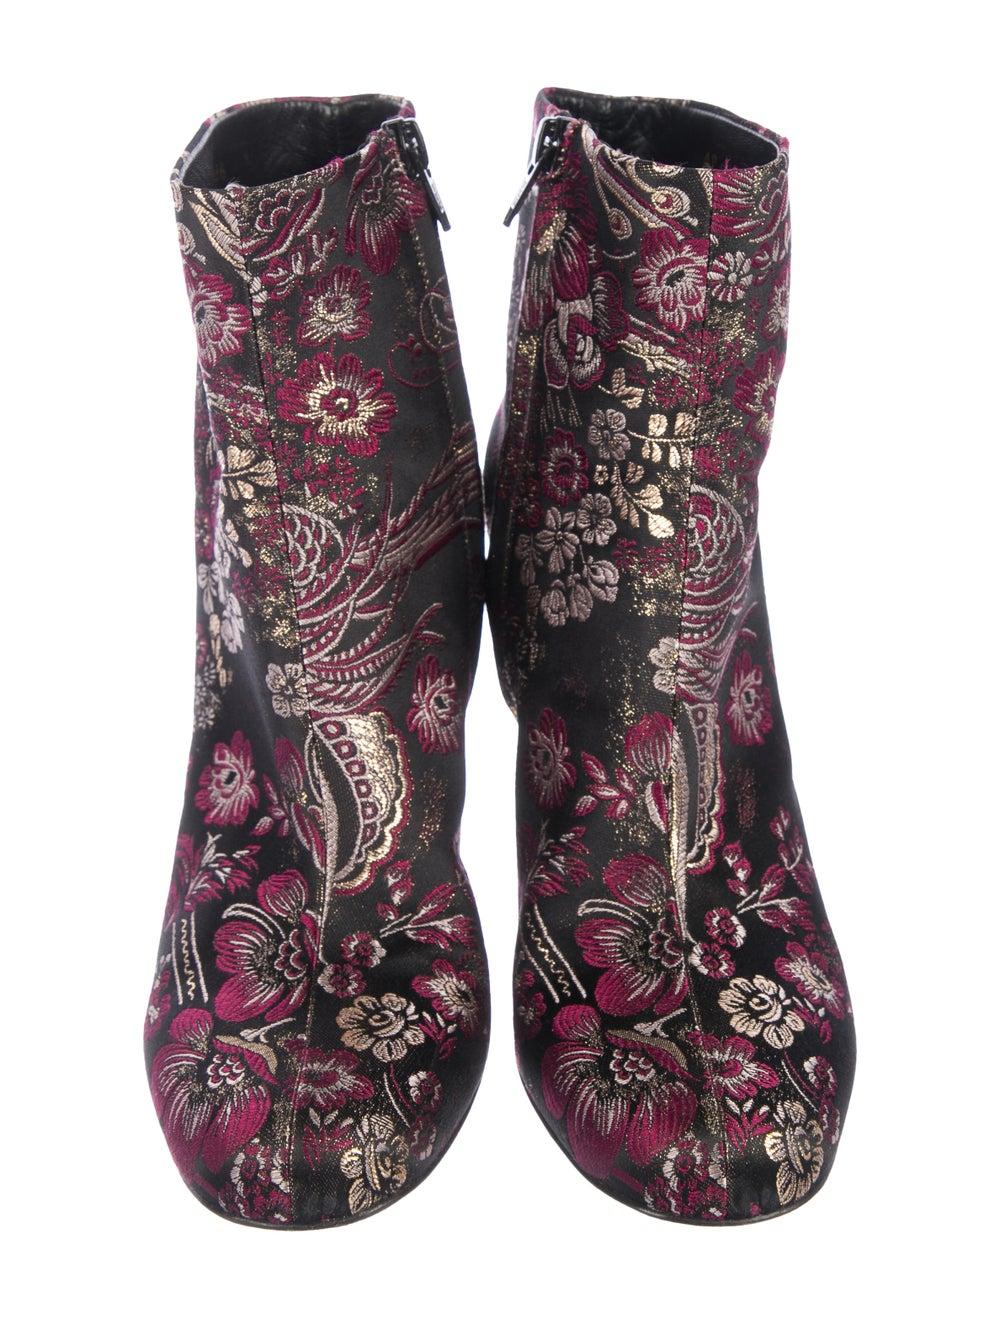 Saint Laurent Brocade Ankle Boots Pink - image 3